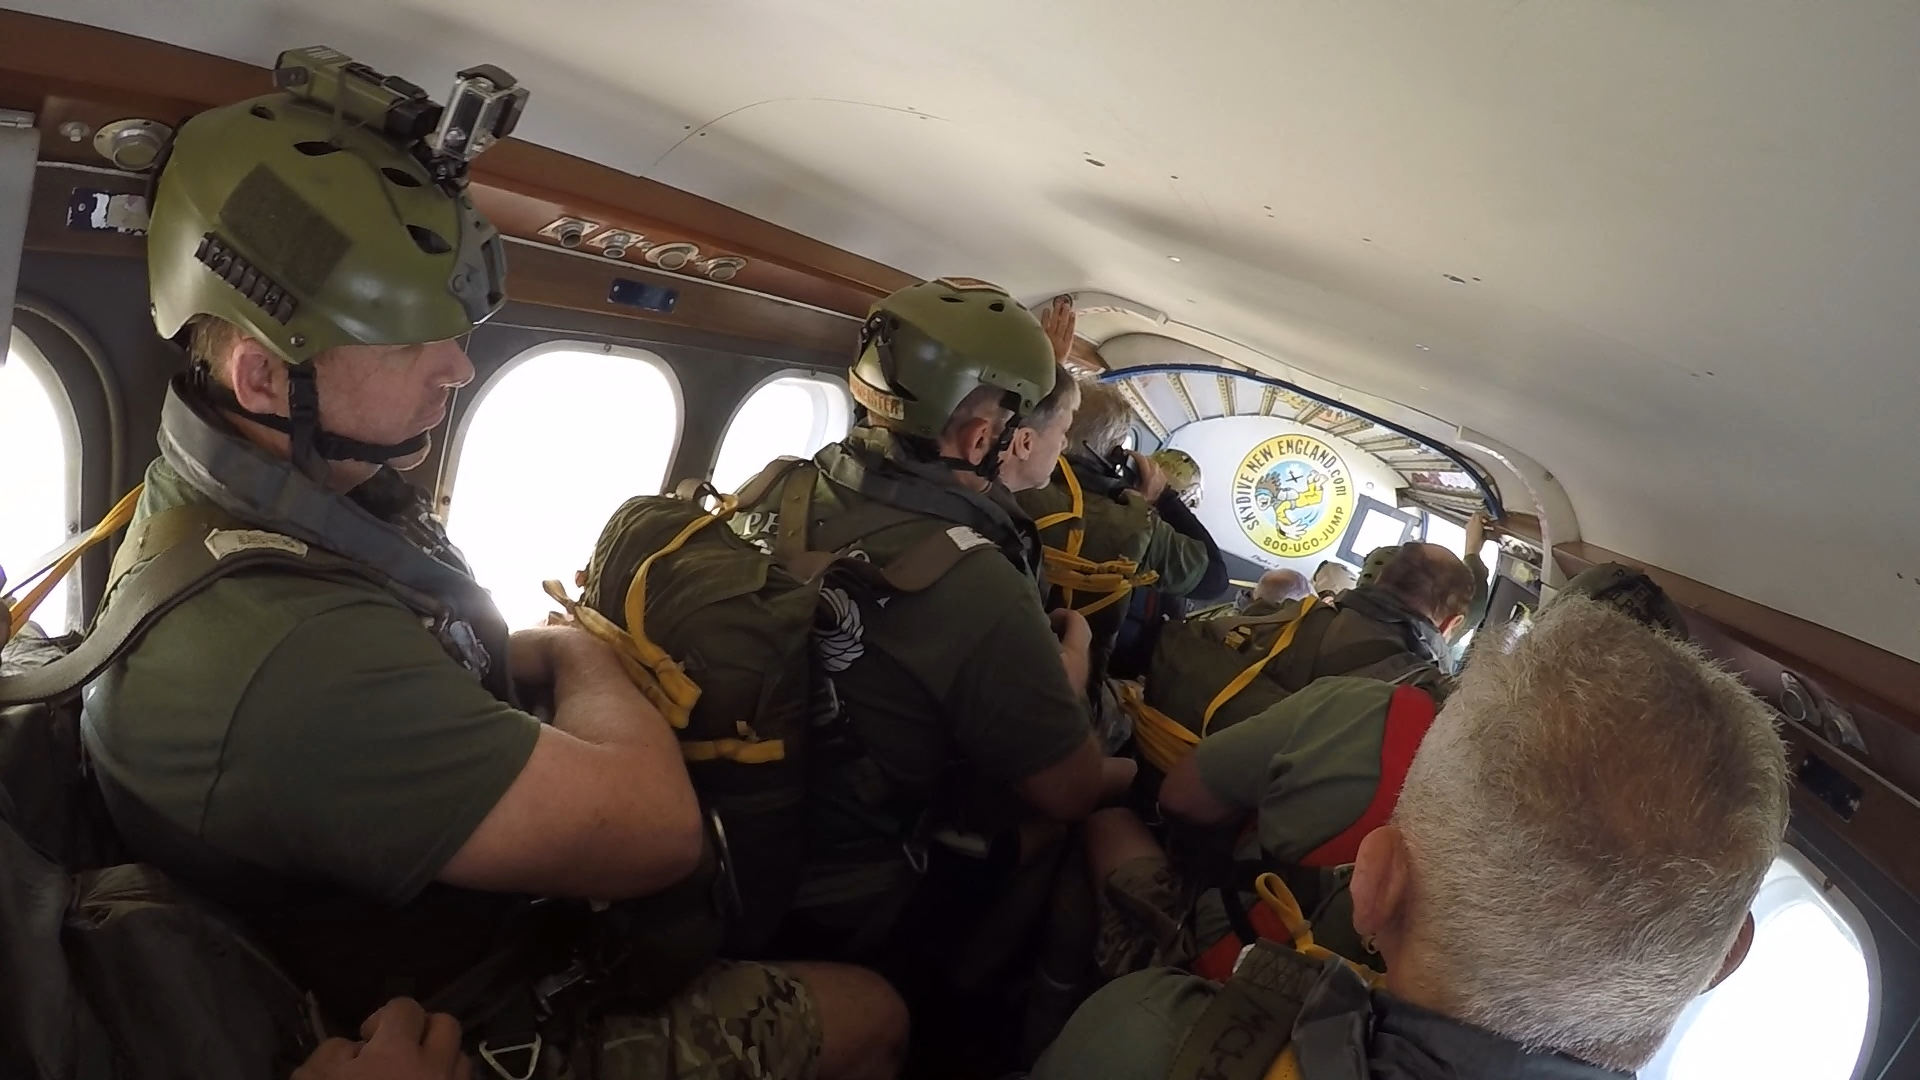 Airborne - 160409 - Packed plane.jpg